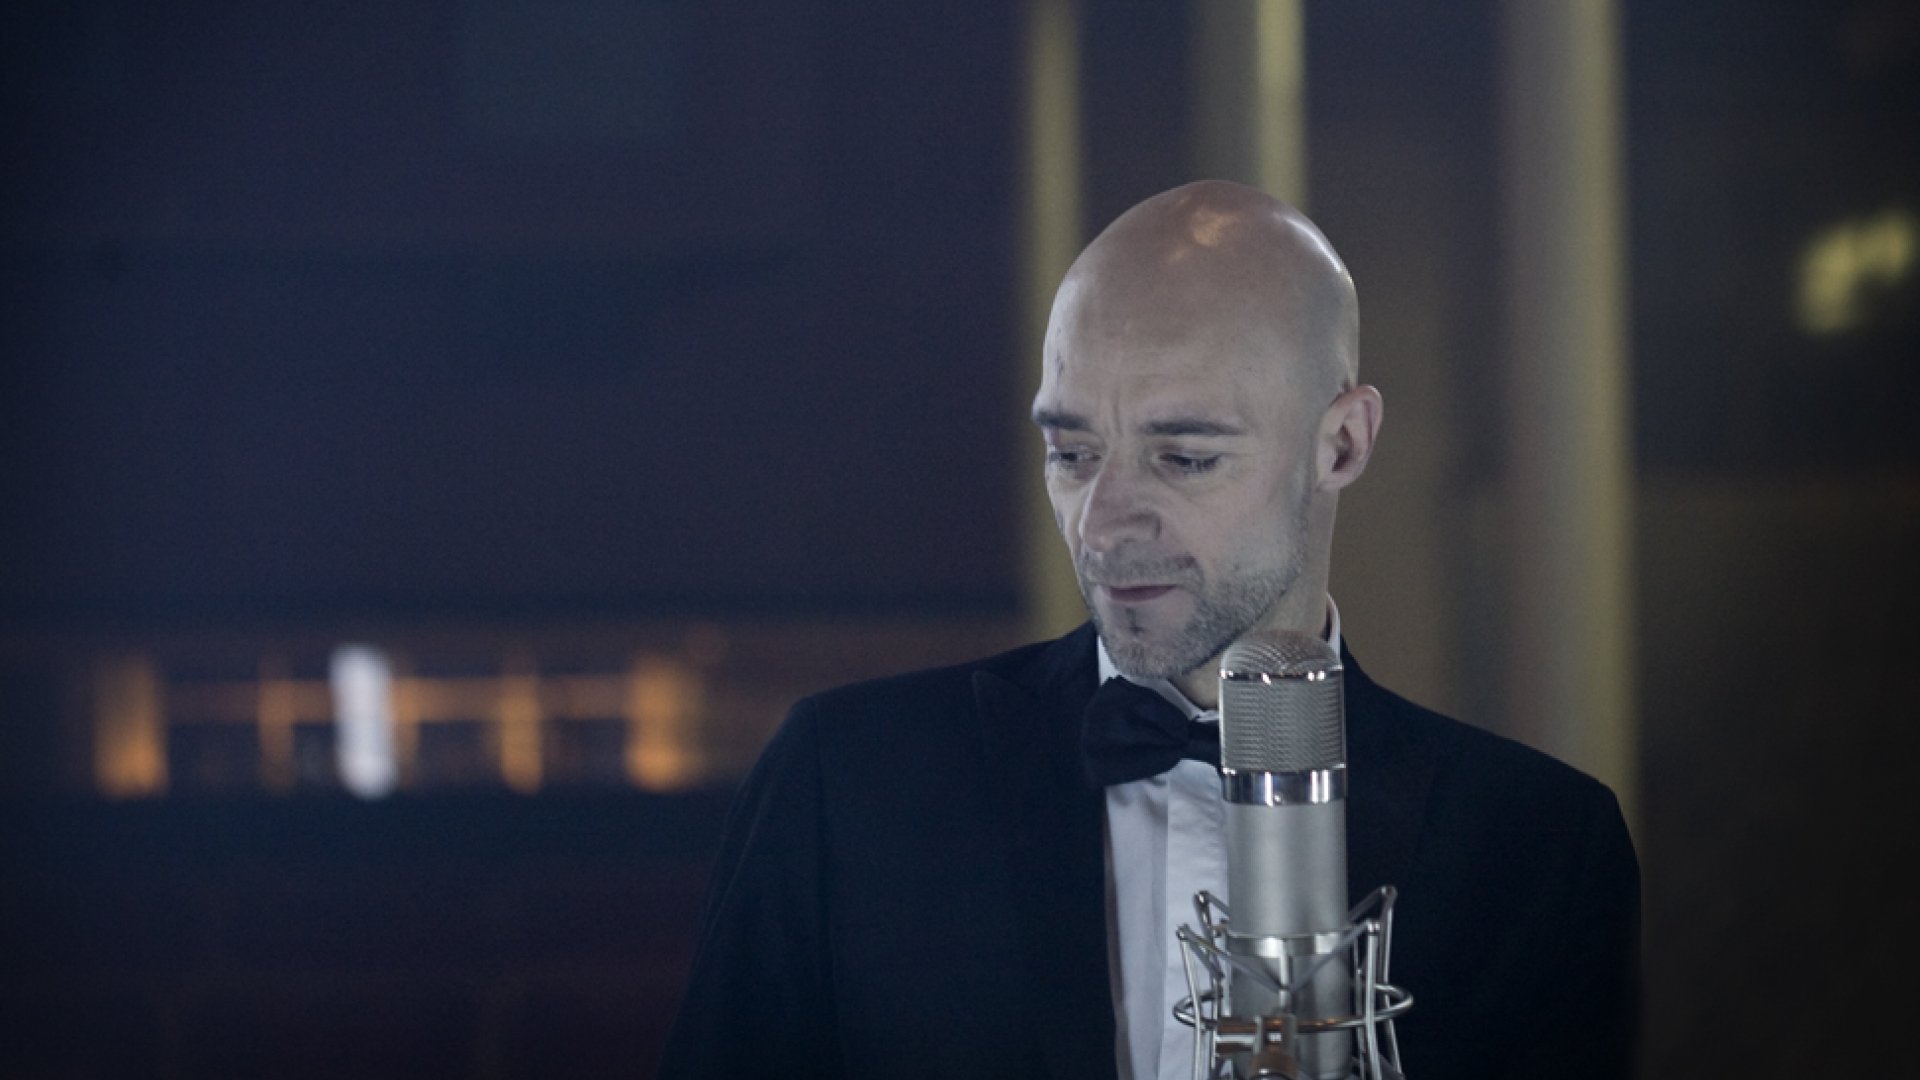 Koncert: Jimmy Jørgensen @ Industrien